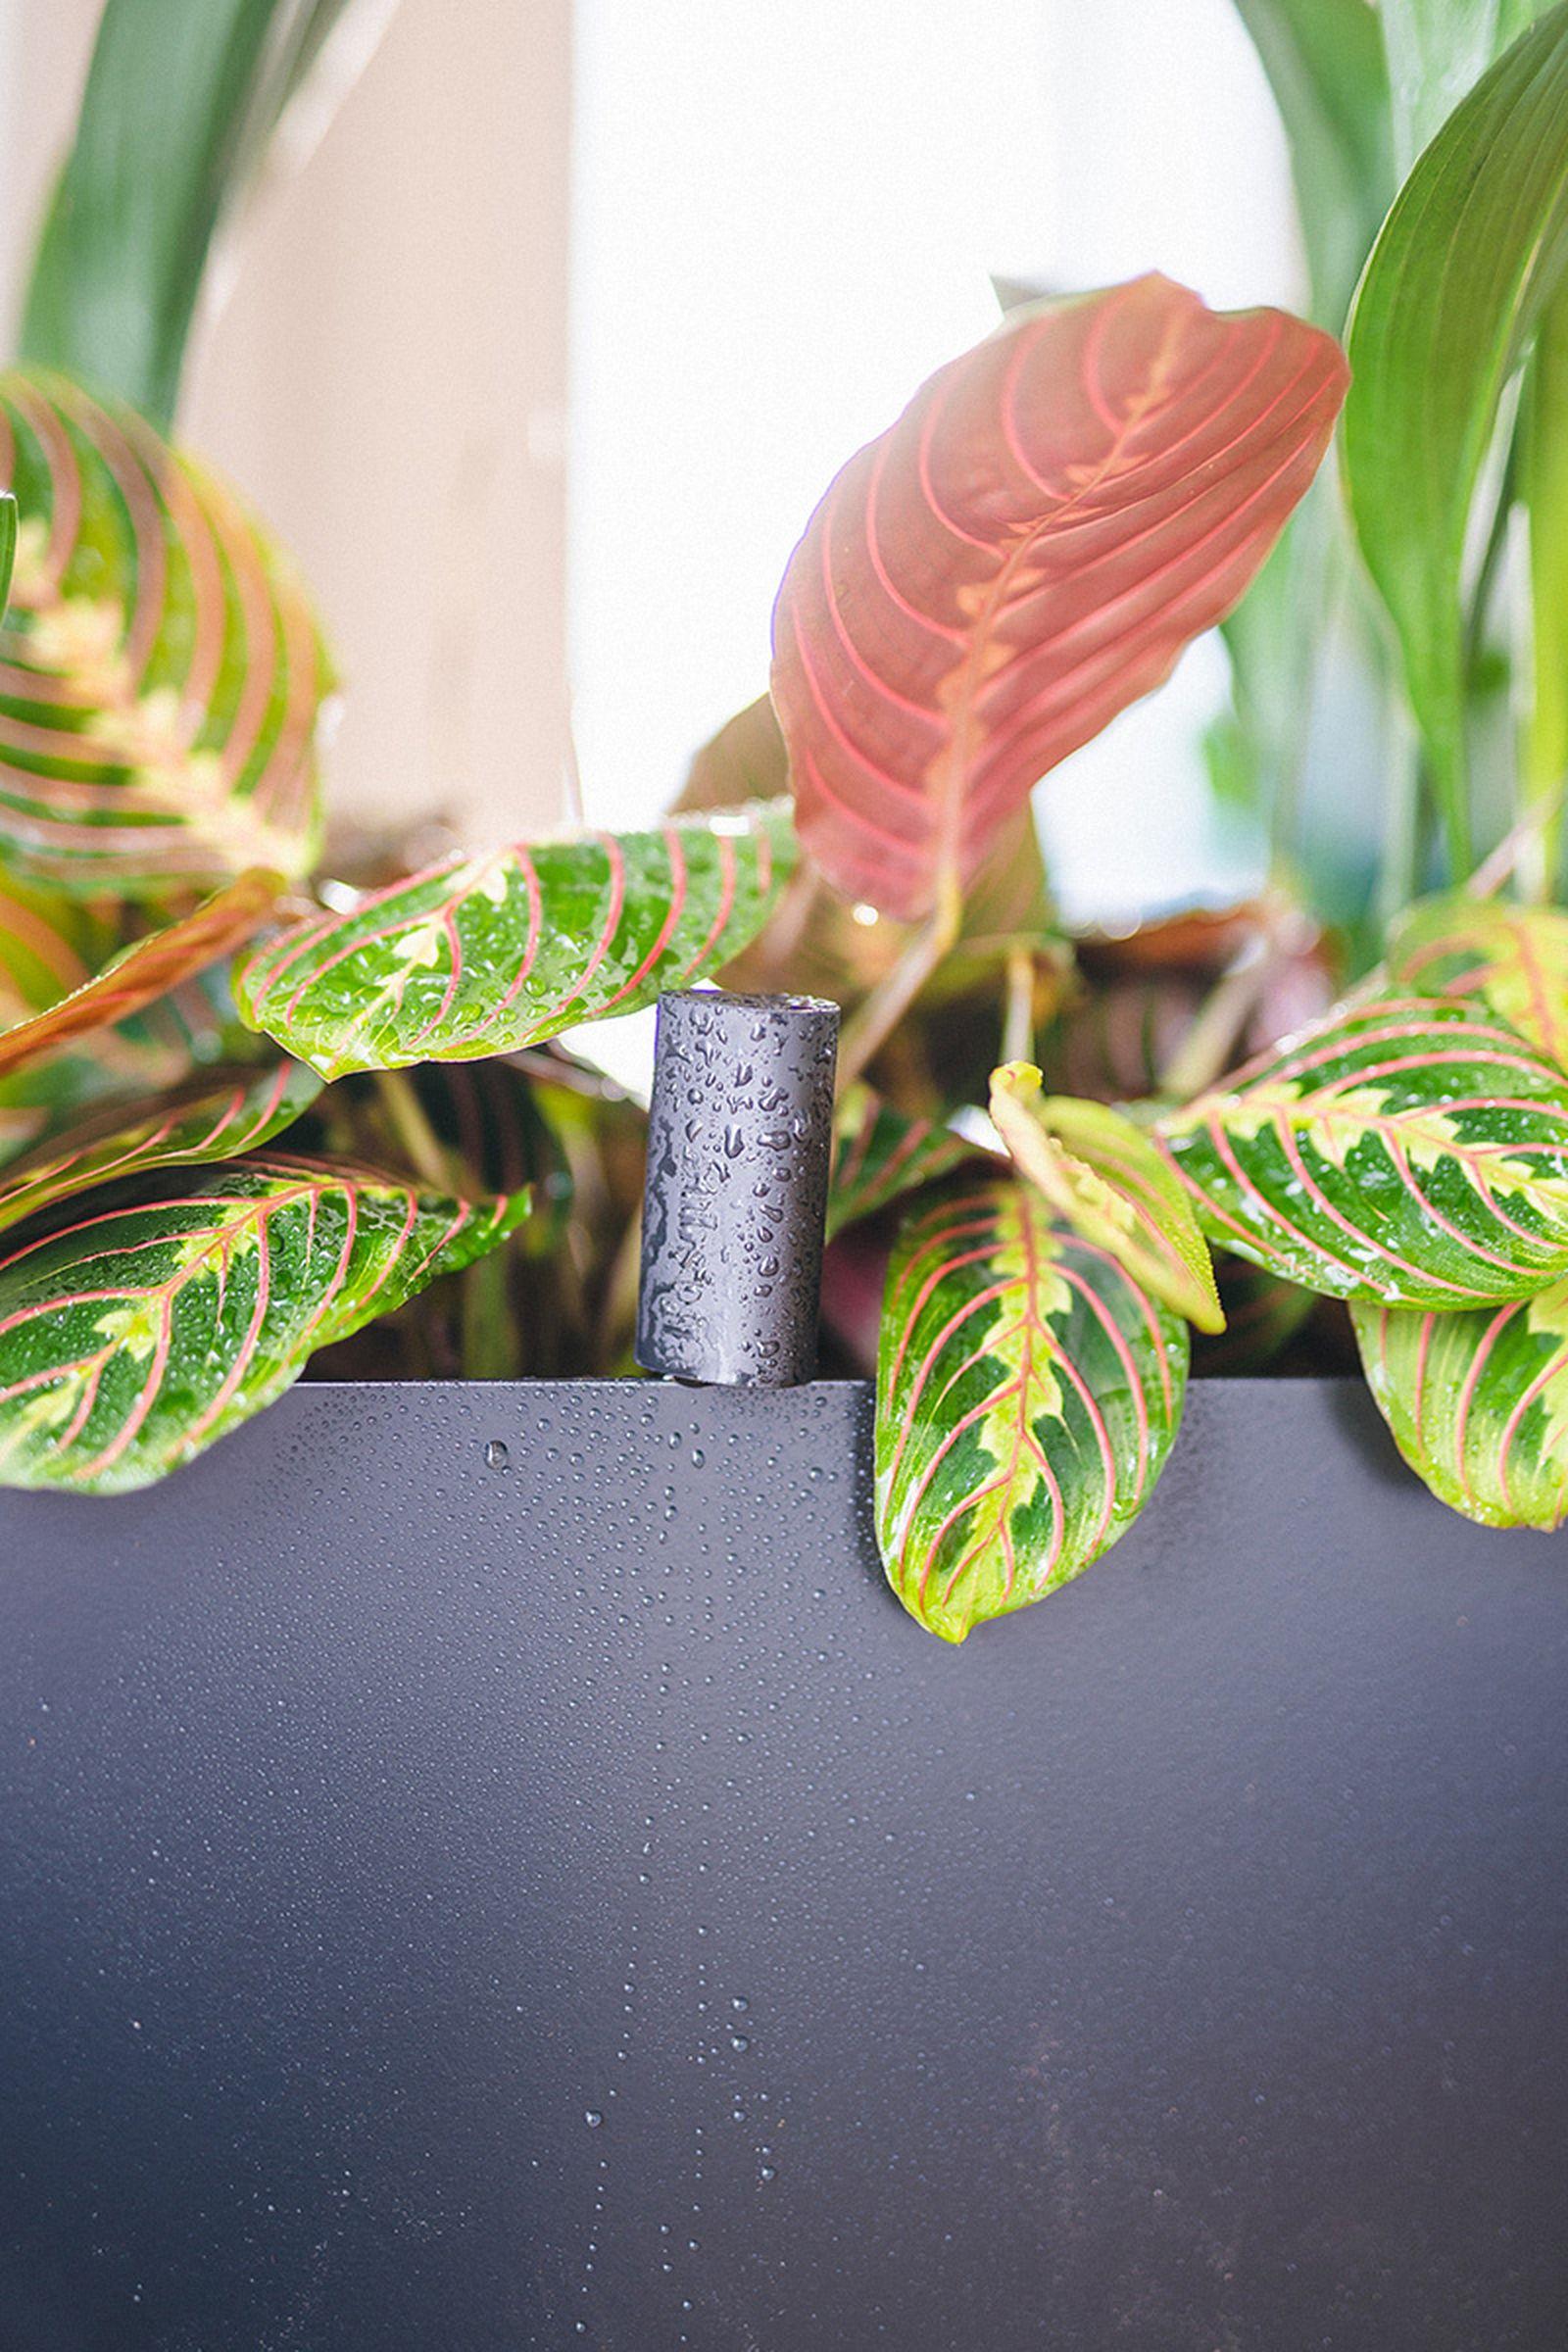 easy-house-plants-for-beginners-18